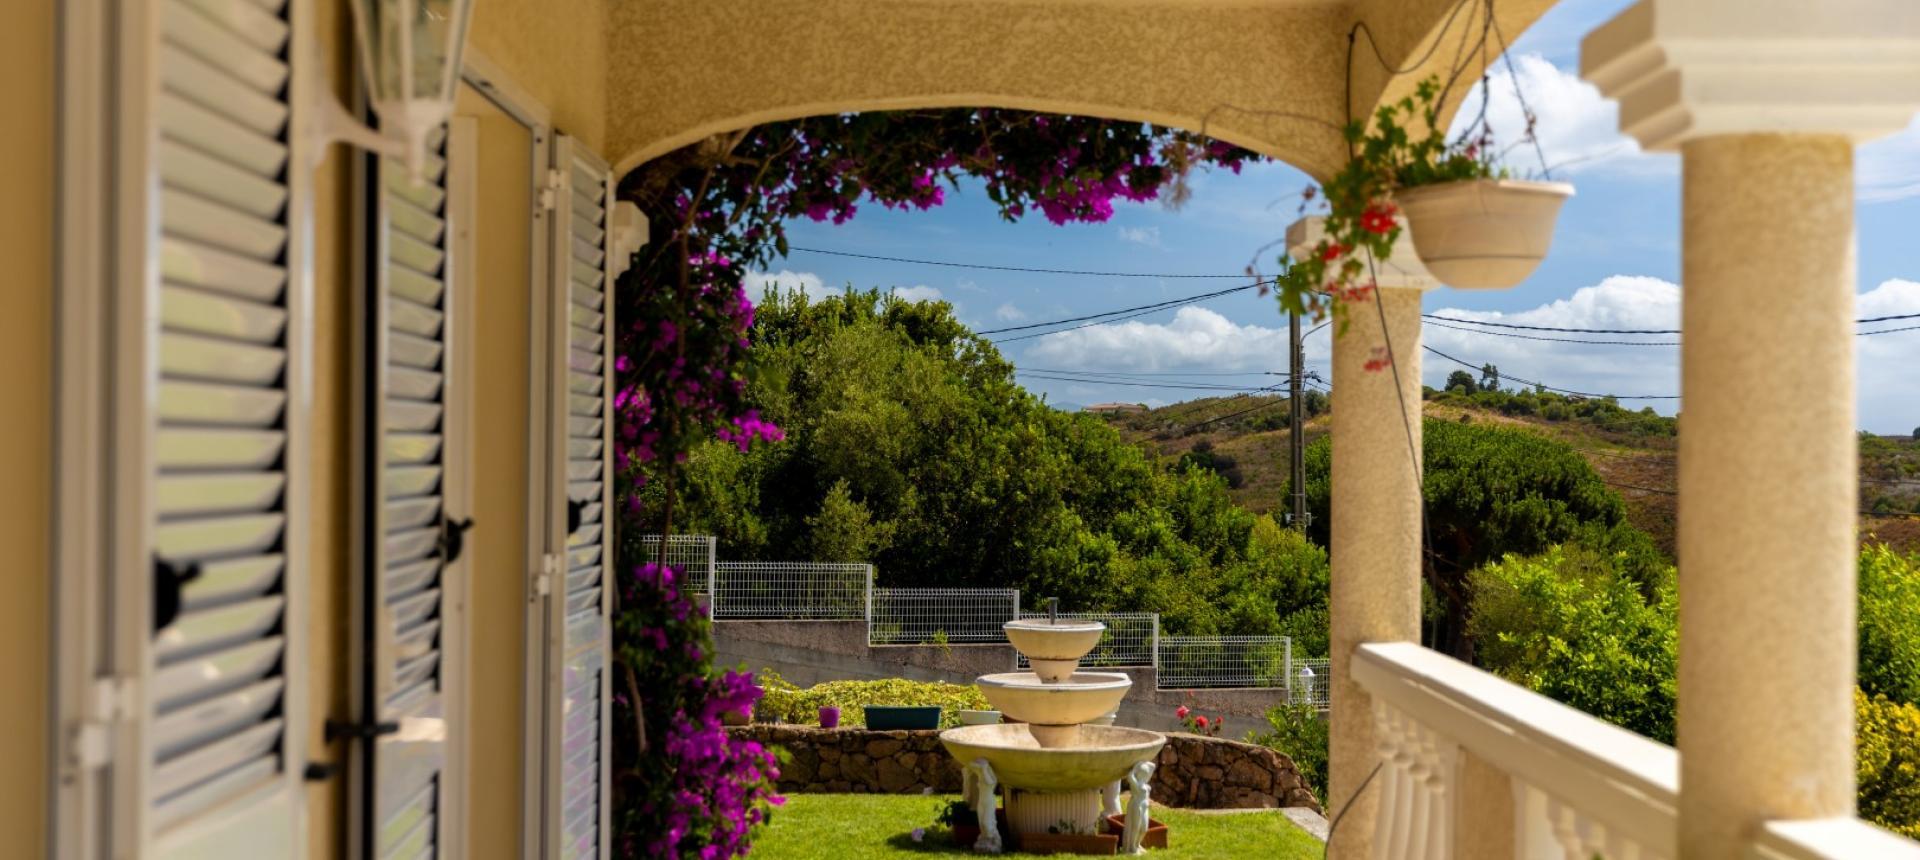 A vendre villa avec vue dégagée proche Ajaccio - AFA - TERRASSE FONTAINE